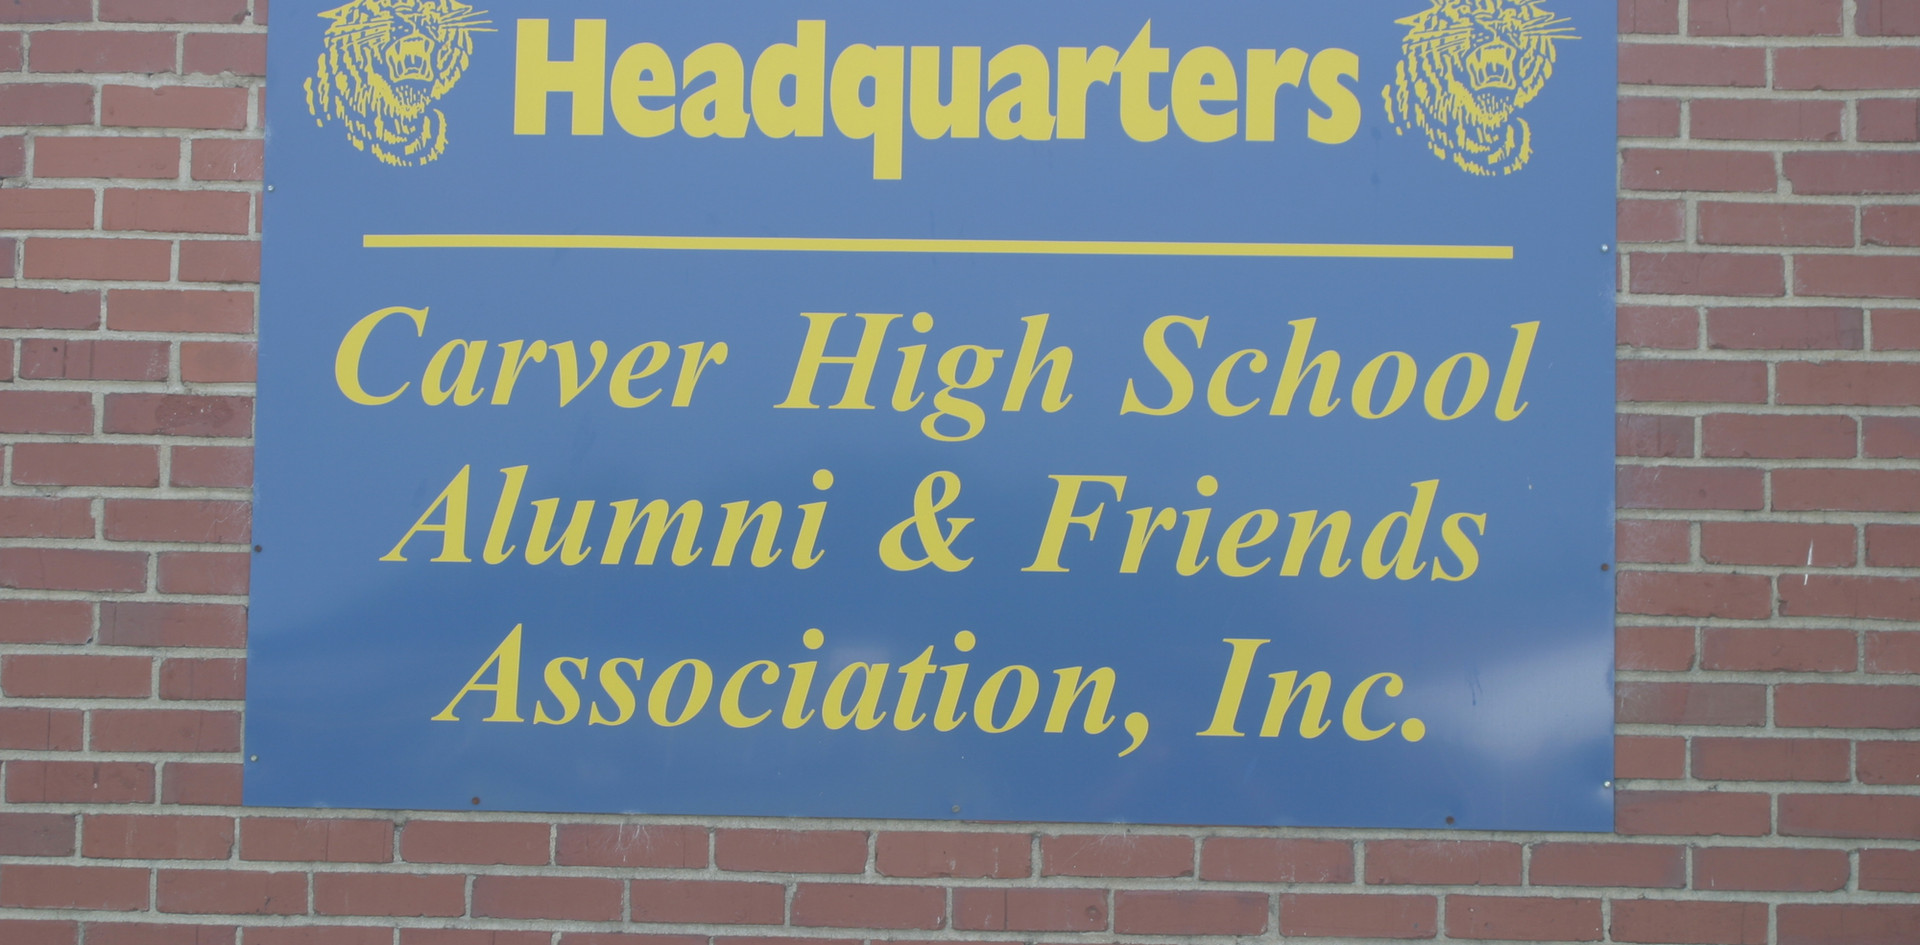 Carver High School Alumni & Friends Wall Plaque